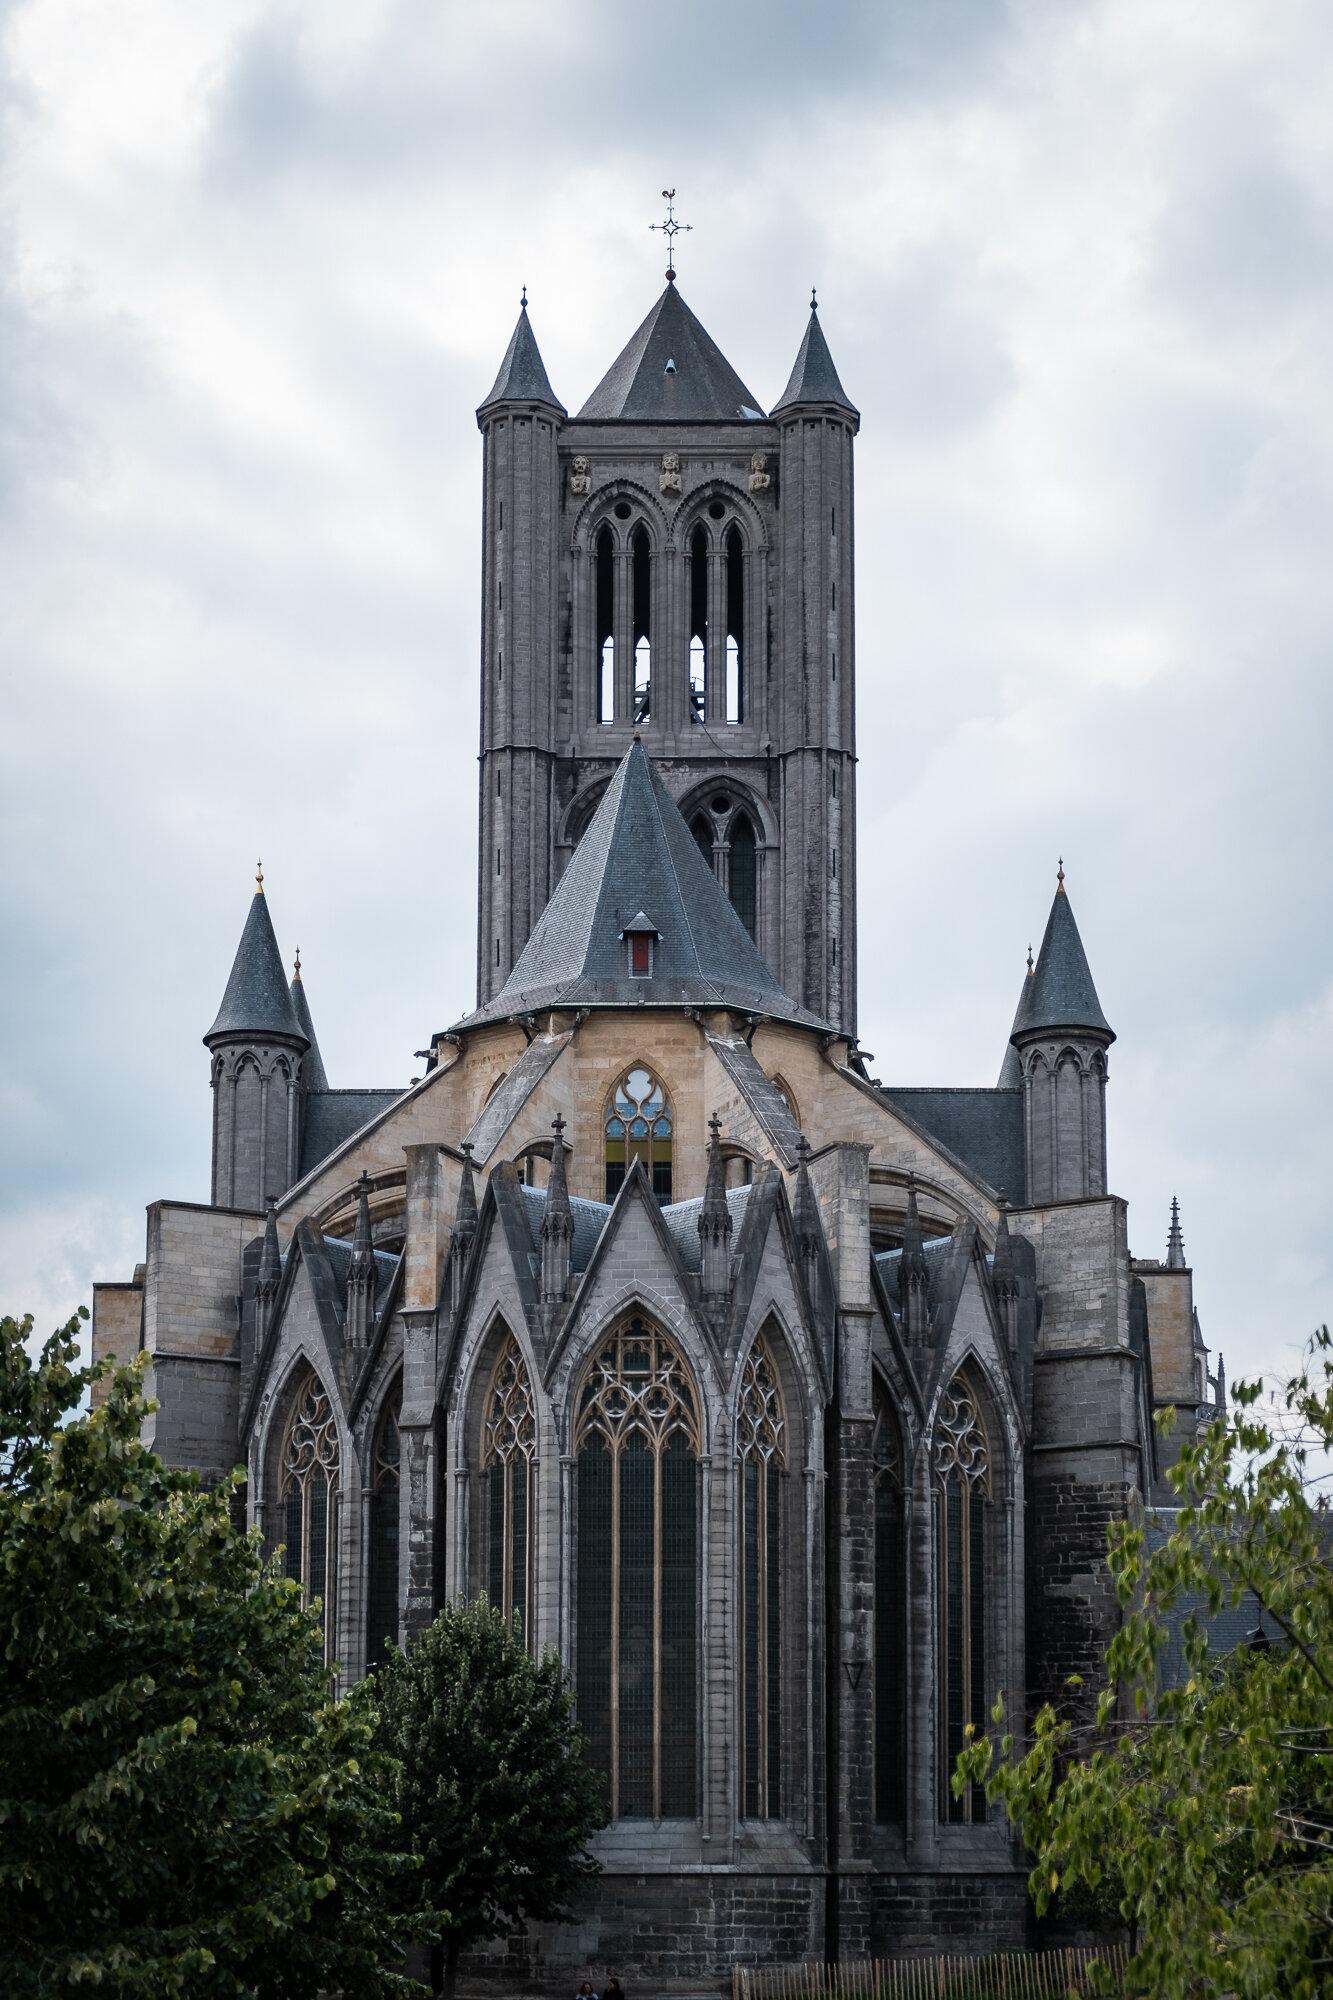 St. Nicholas' Church from the rear